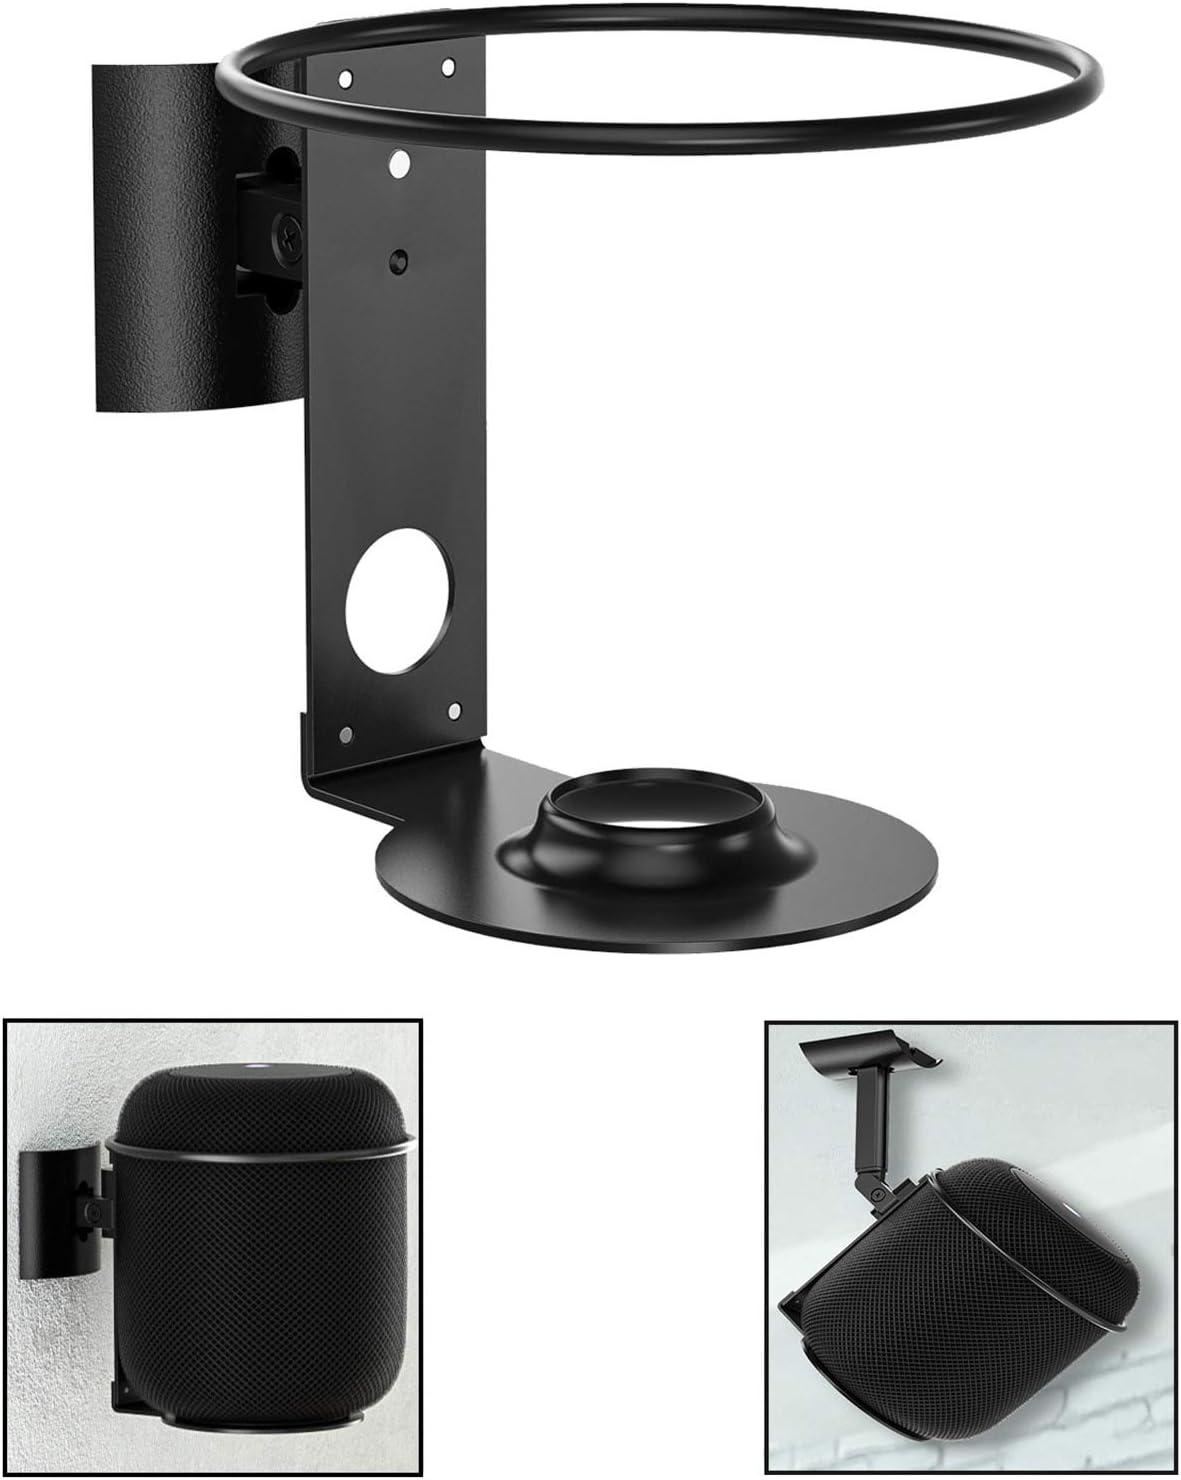 Wall Mount Holder Compatible with Apple HomePod Tilt & Swivel Adjustable Bracket Stand for Apple HomePod Smart Speaker, Black